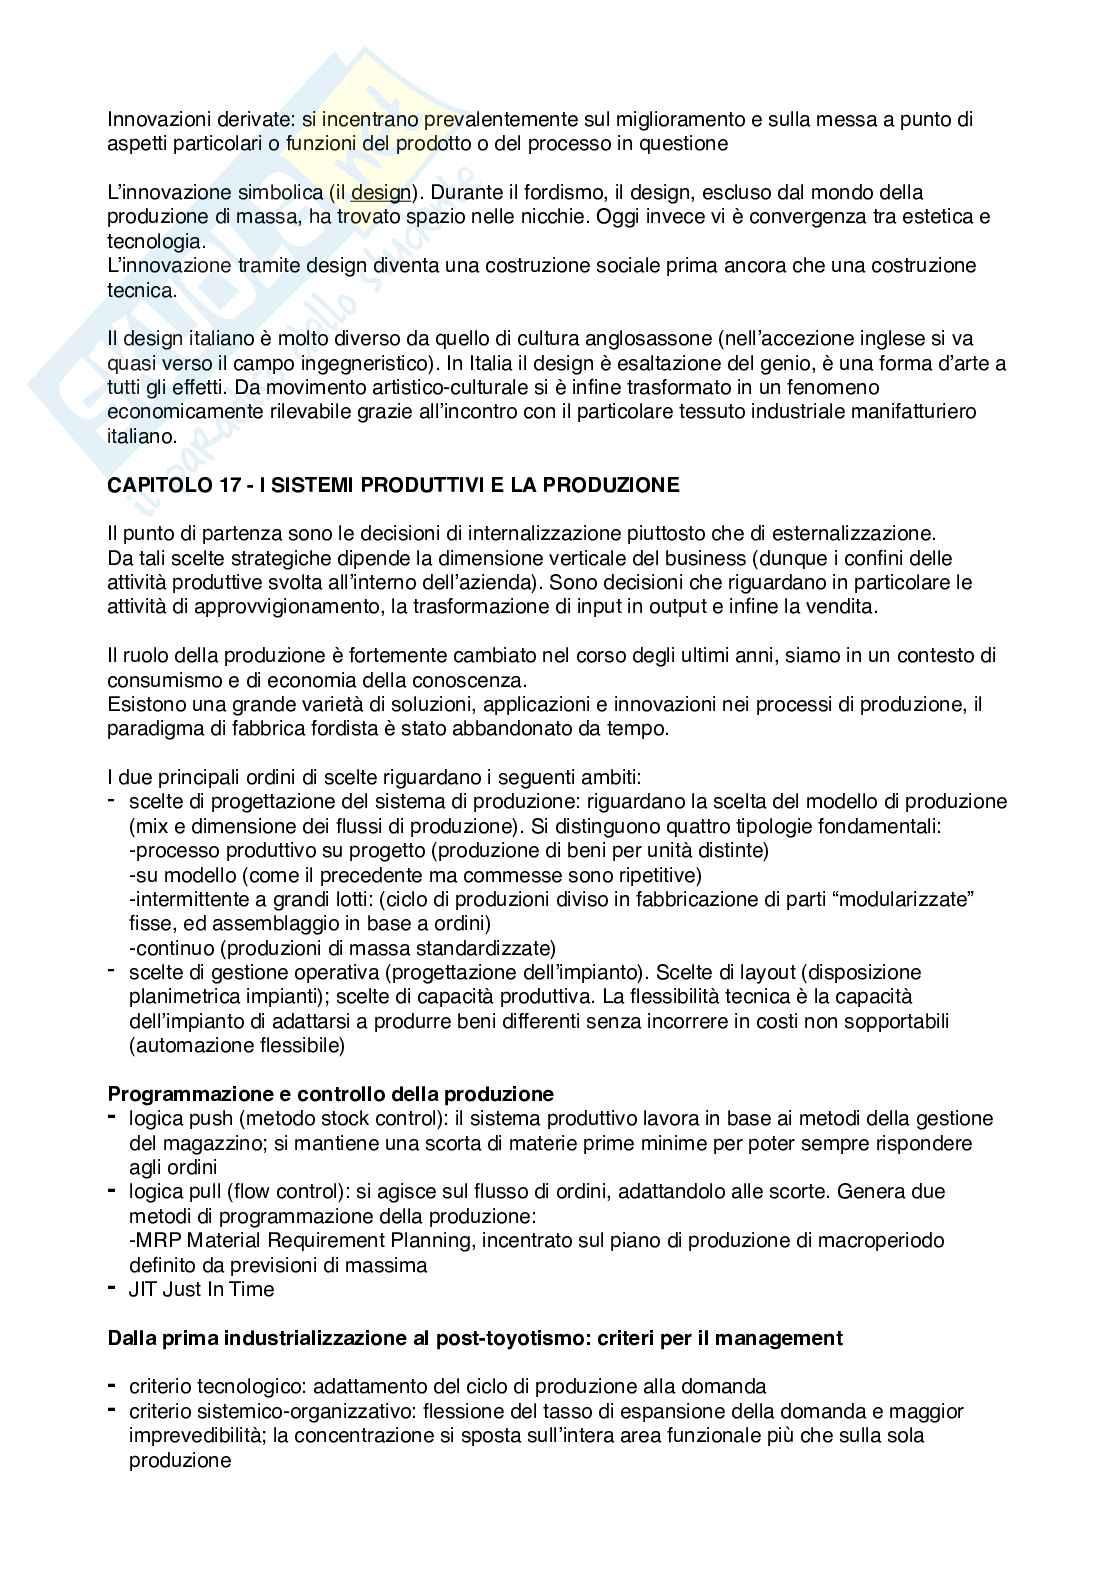 Management - Riassunto lezioni Pag. 31